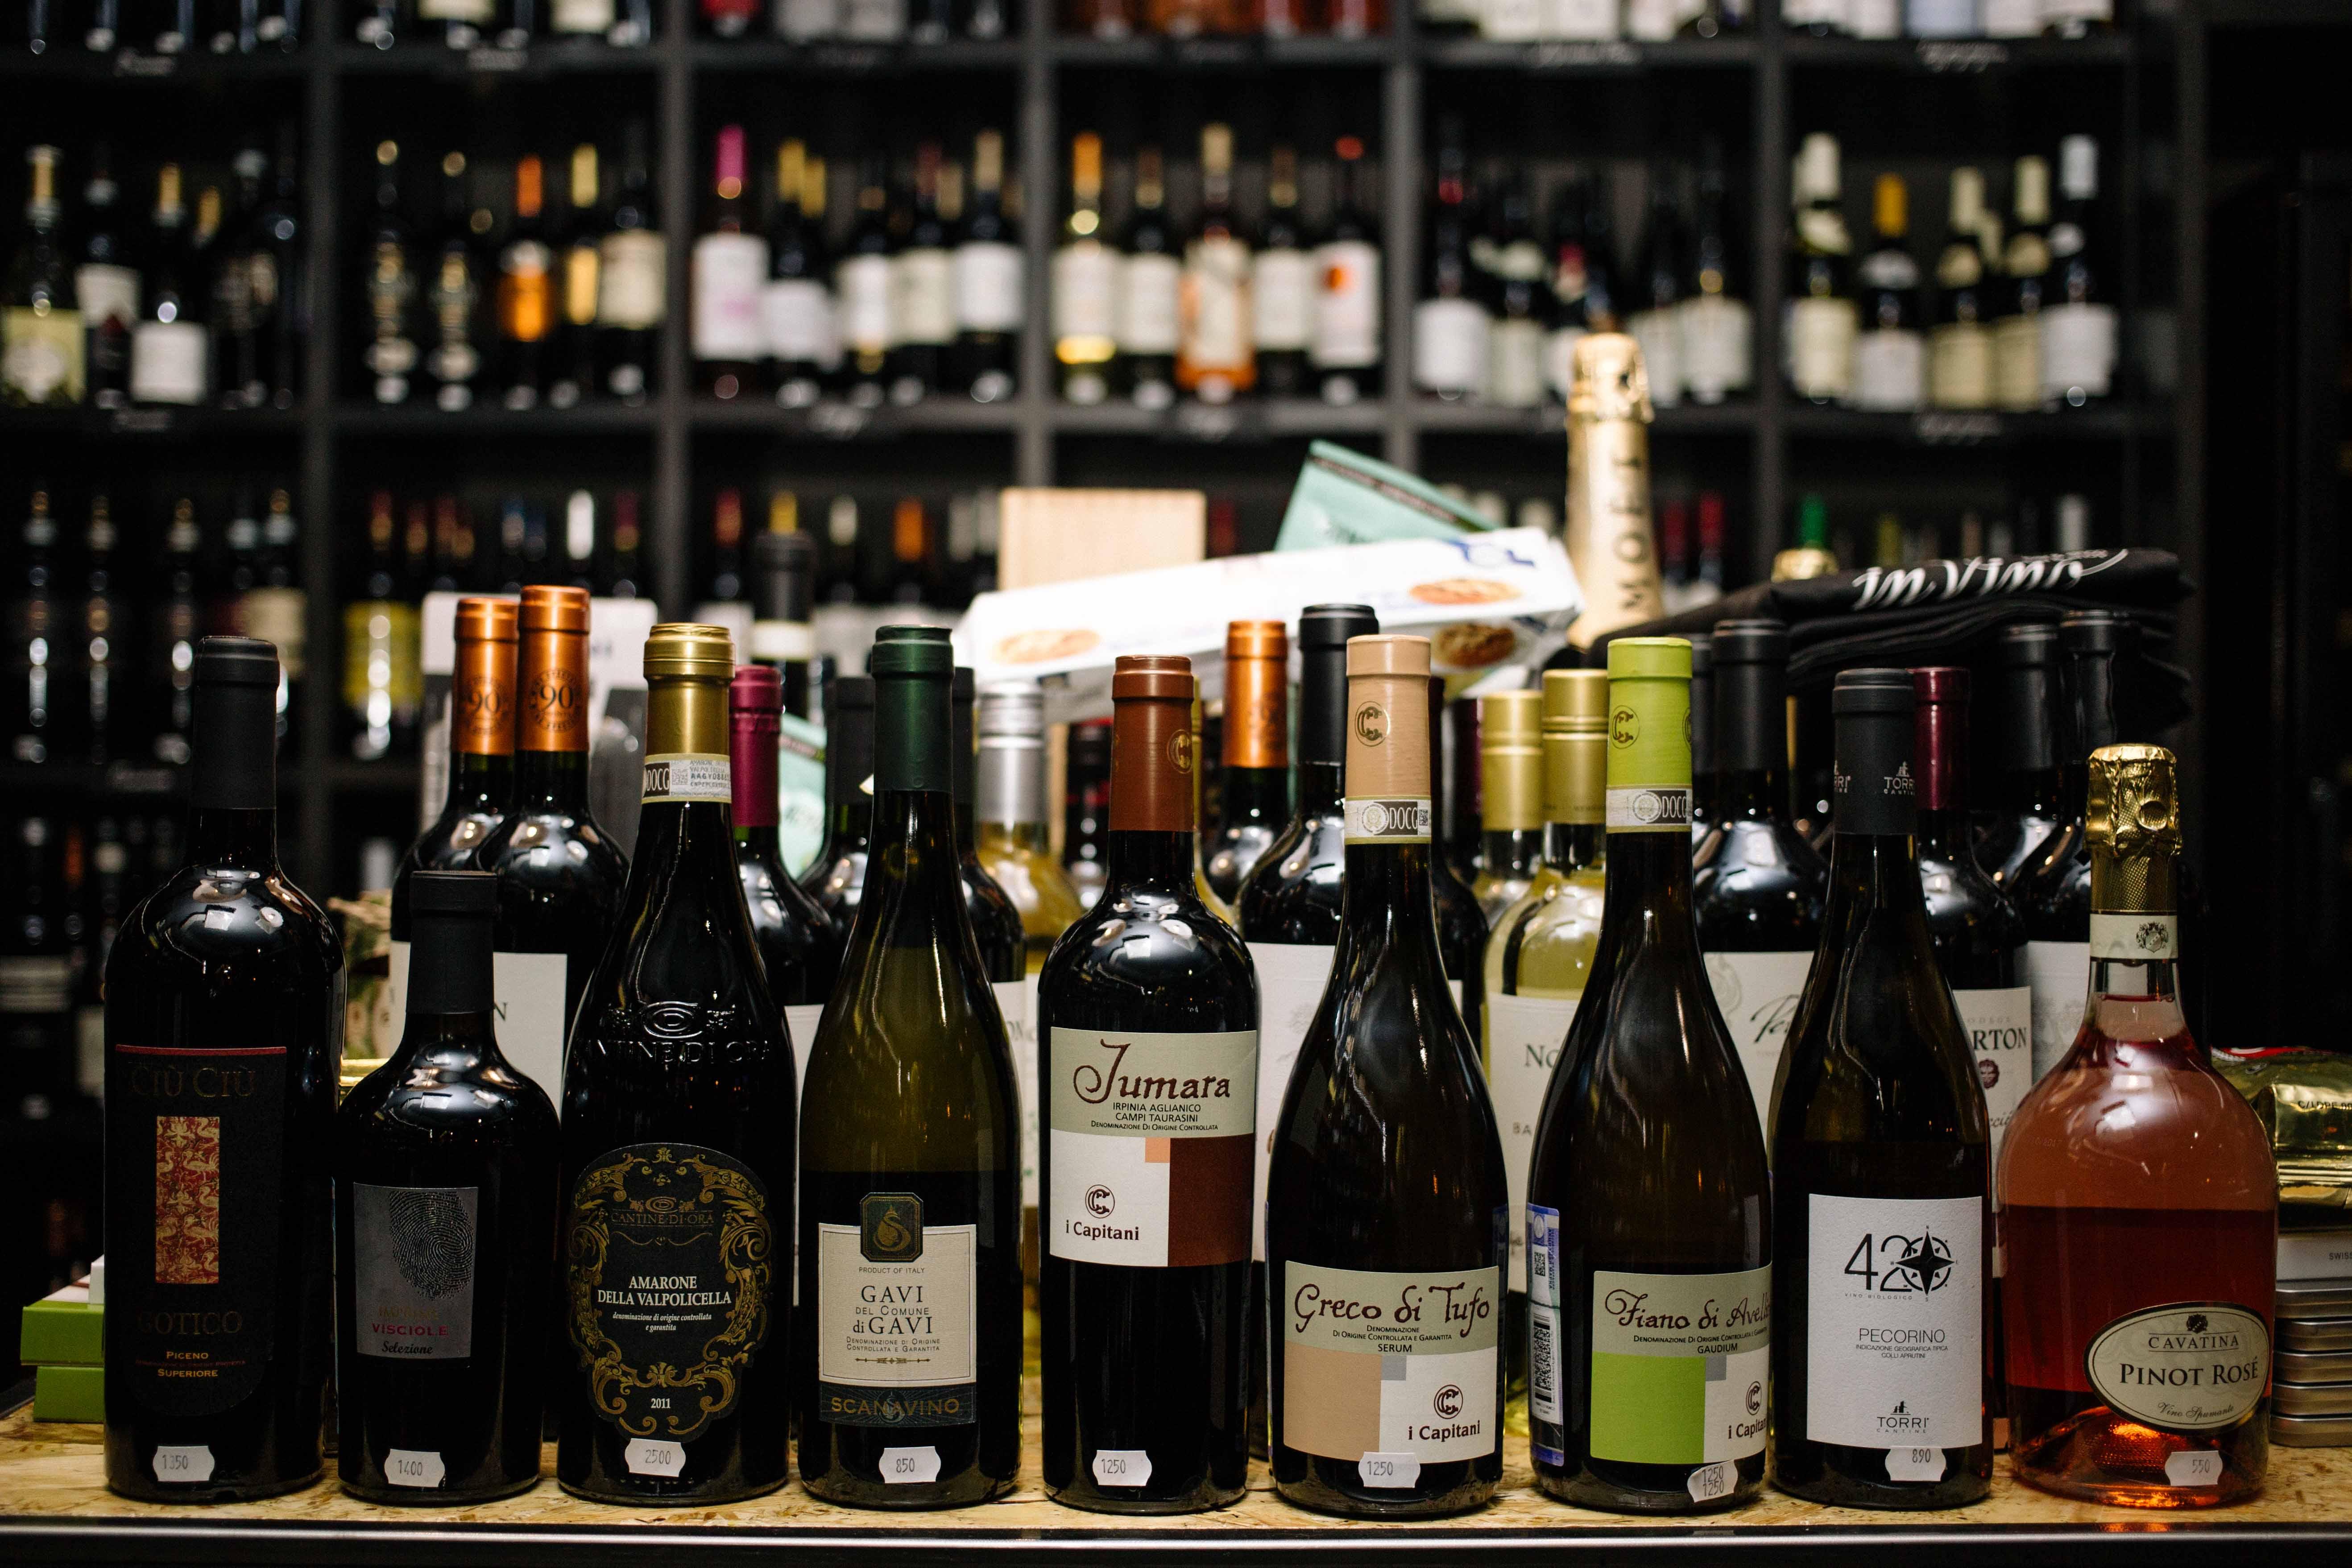 итальянские вина названия и фото познакомились спортзале